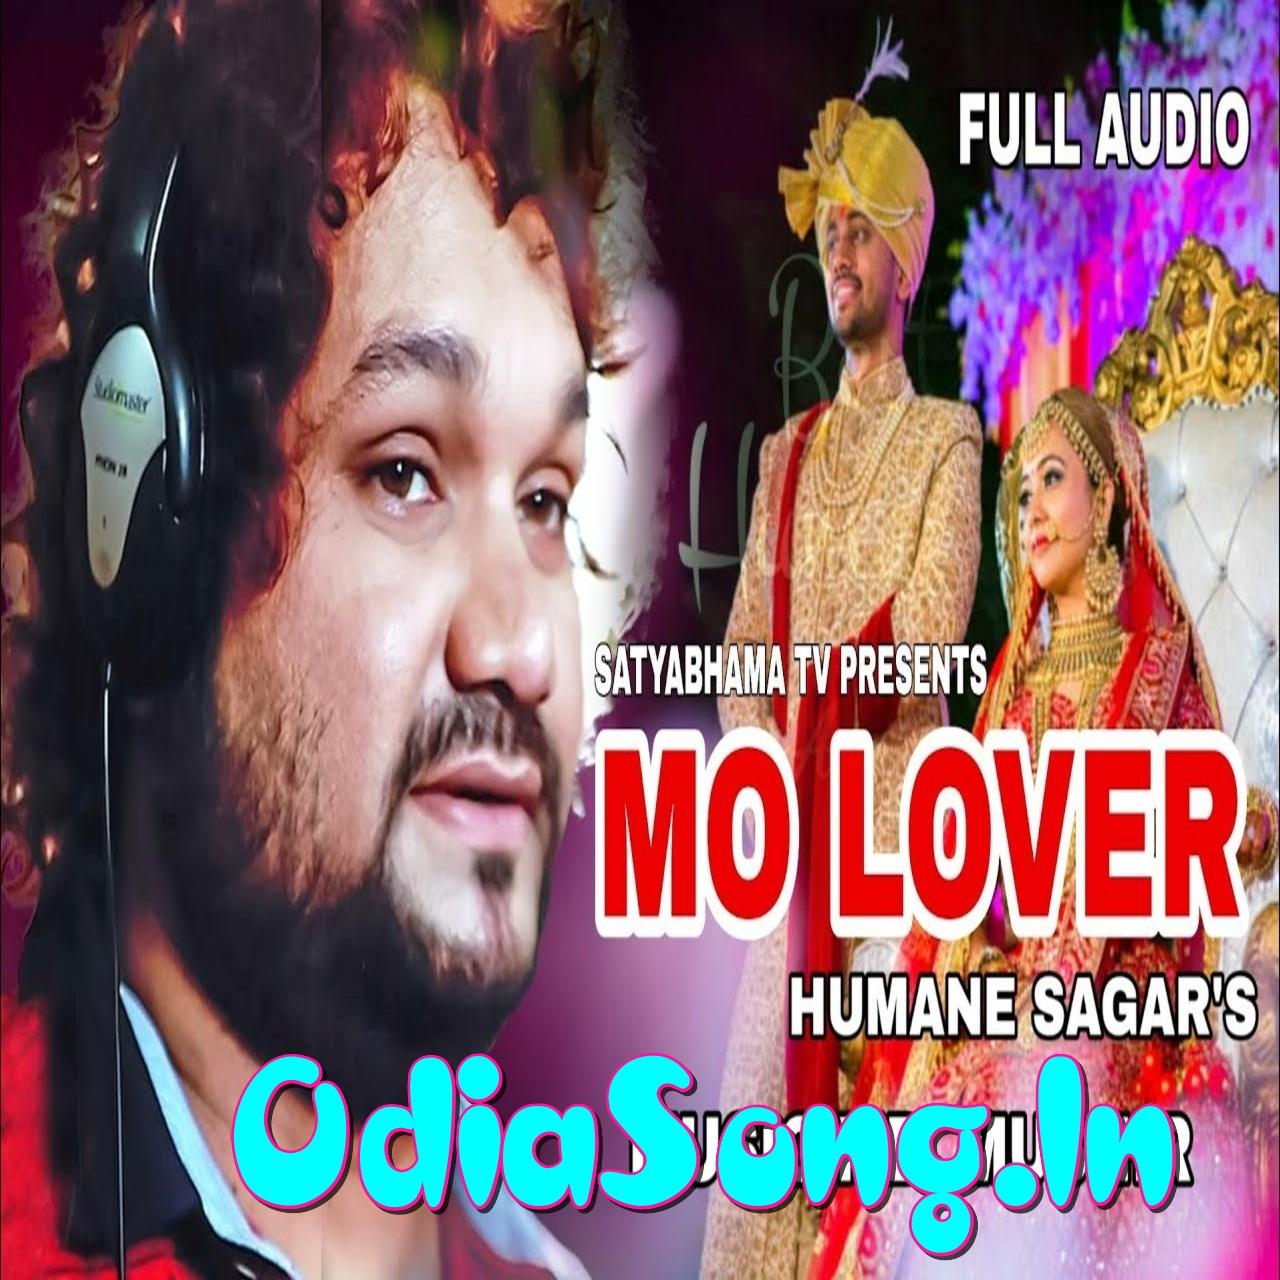 Mo Lover (Humane Sagar)